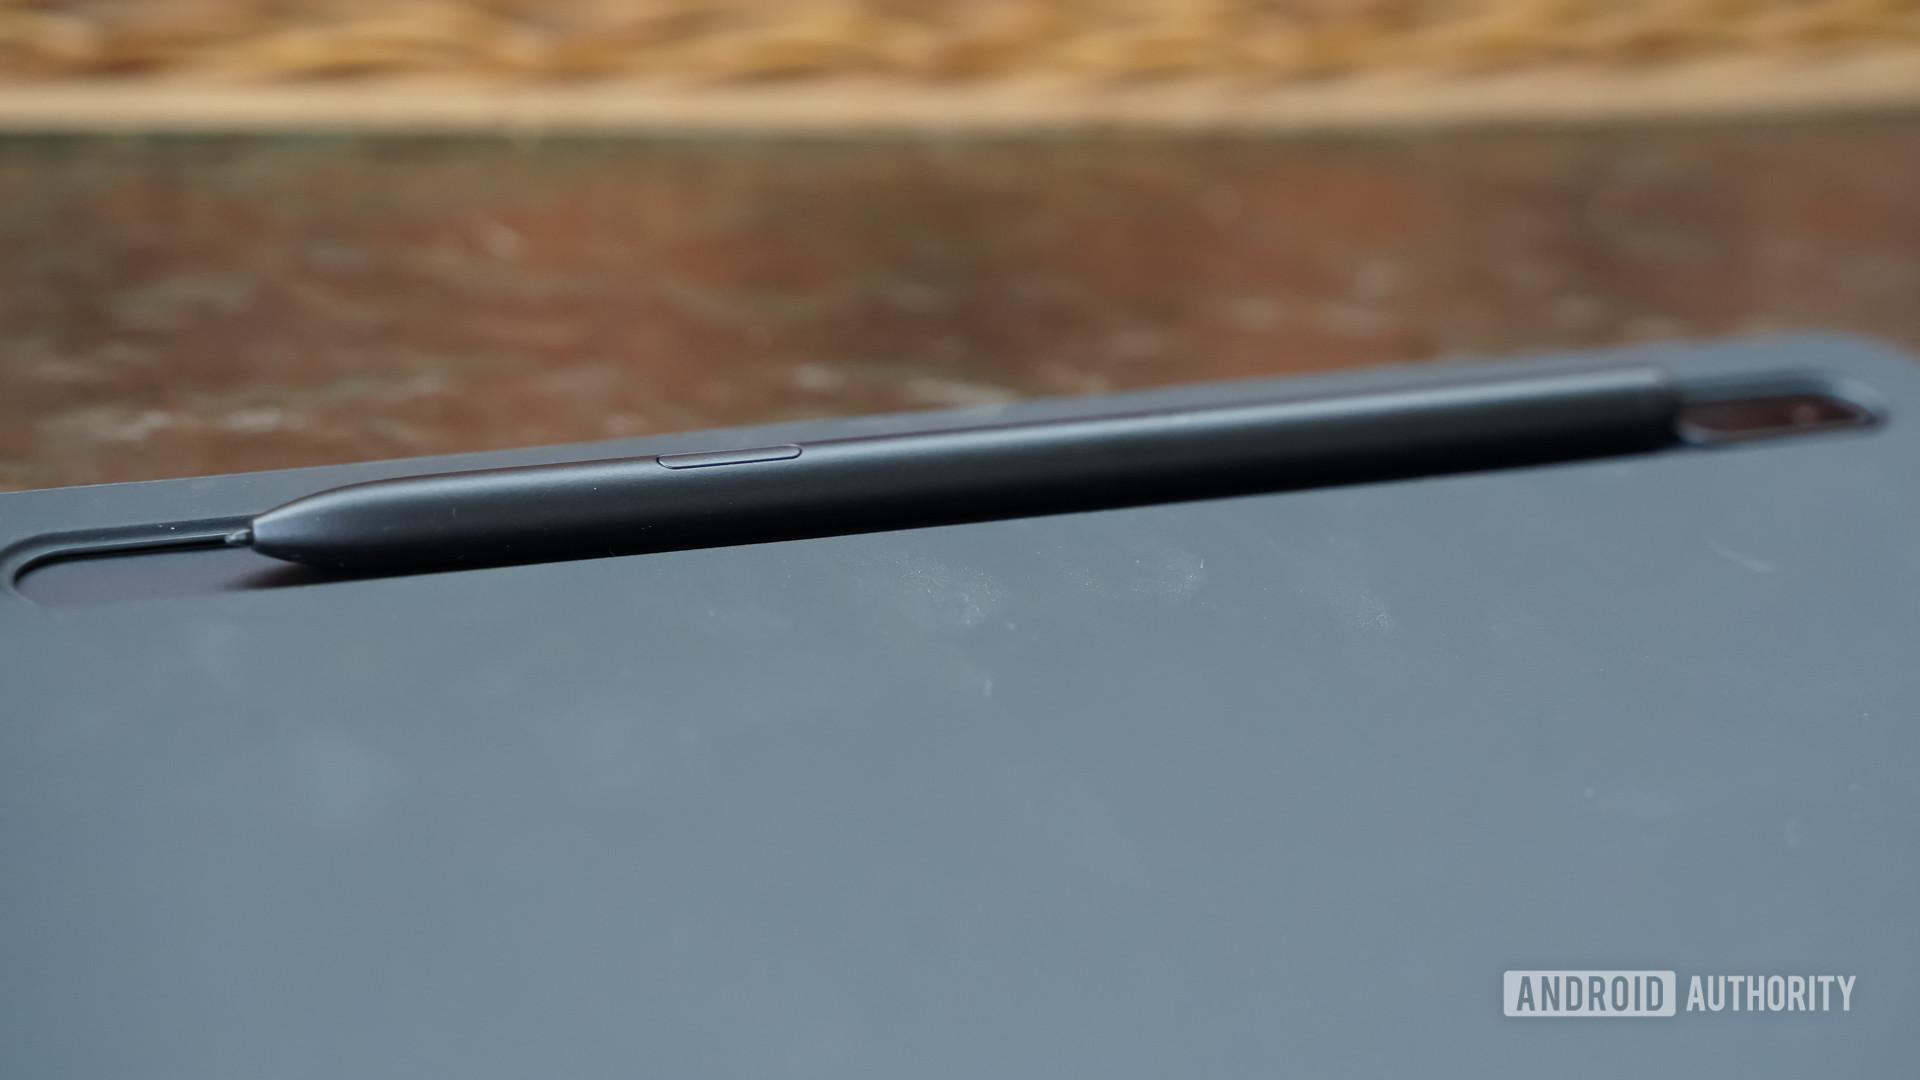 Samsung Galaxy Tab S7 FE S Pen slot